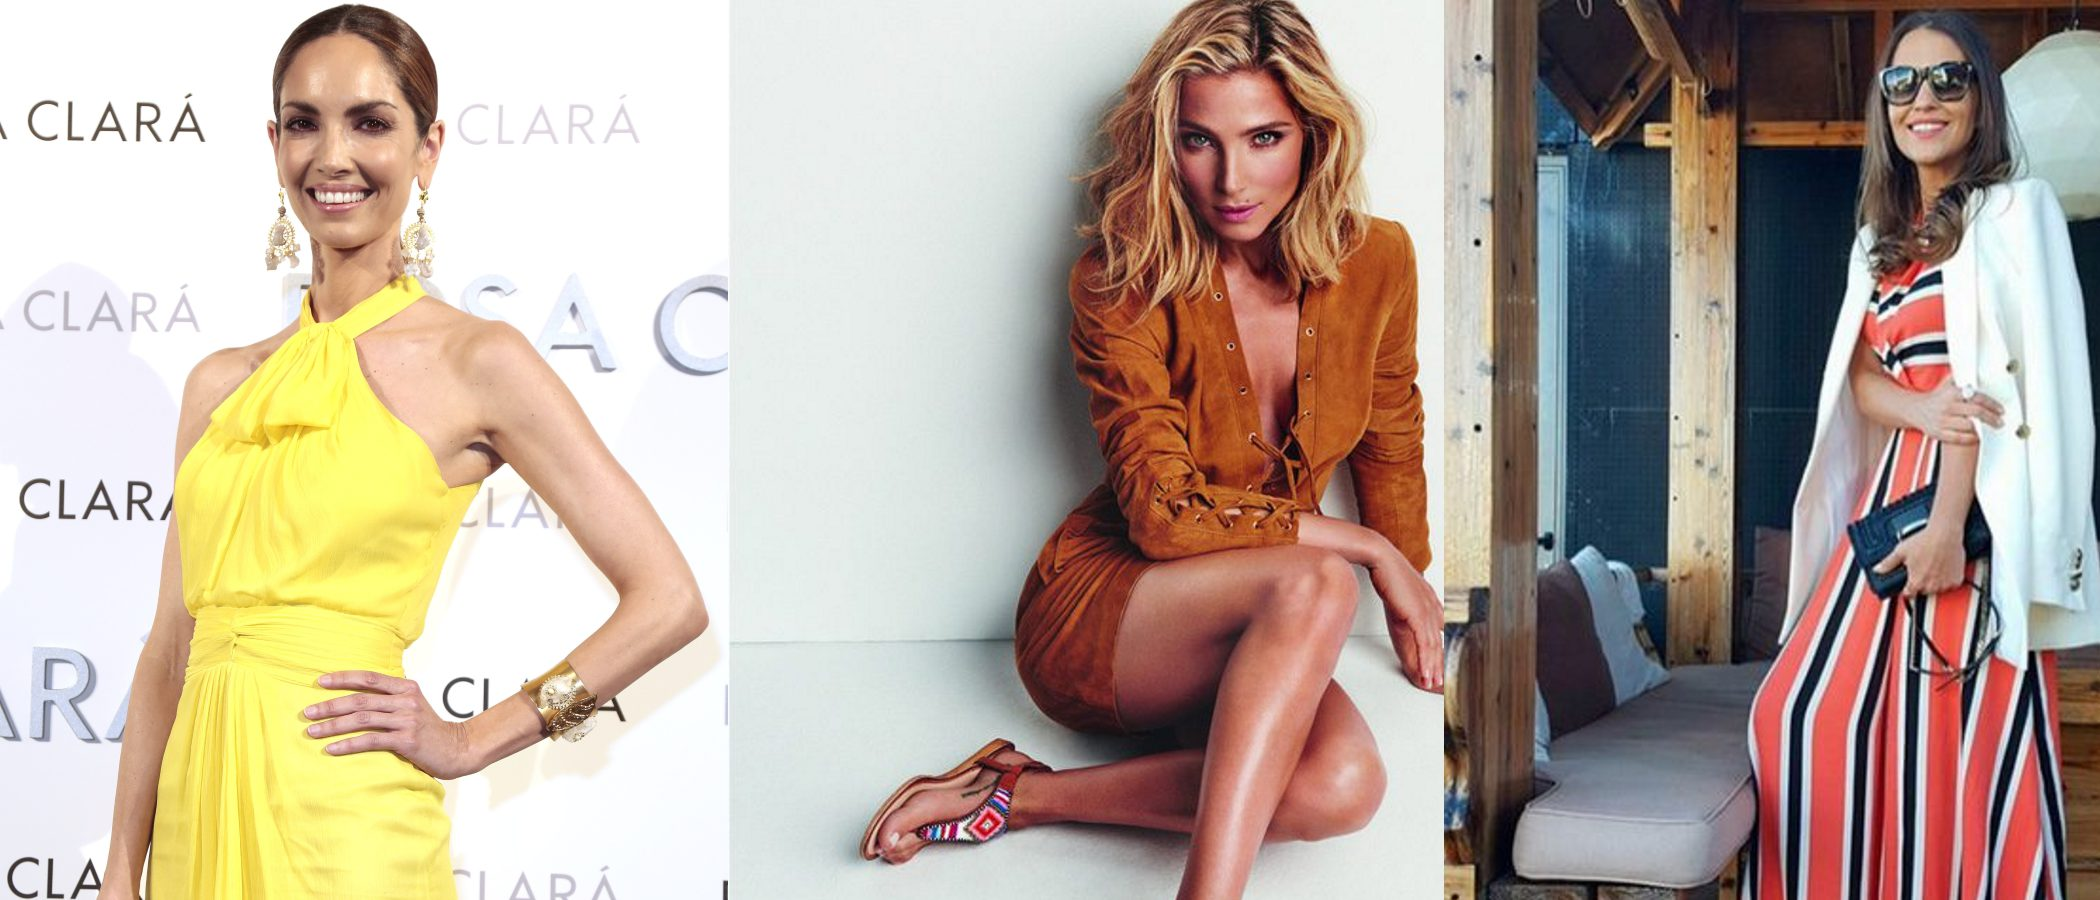 Ángel Schlesser, Dolores Promesas o las sandalias Omahas de Gioseppo triunfan entre las celebrities